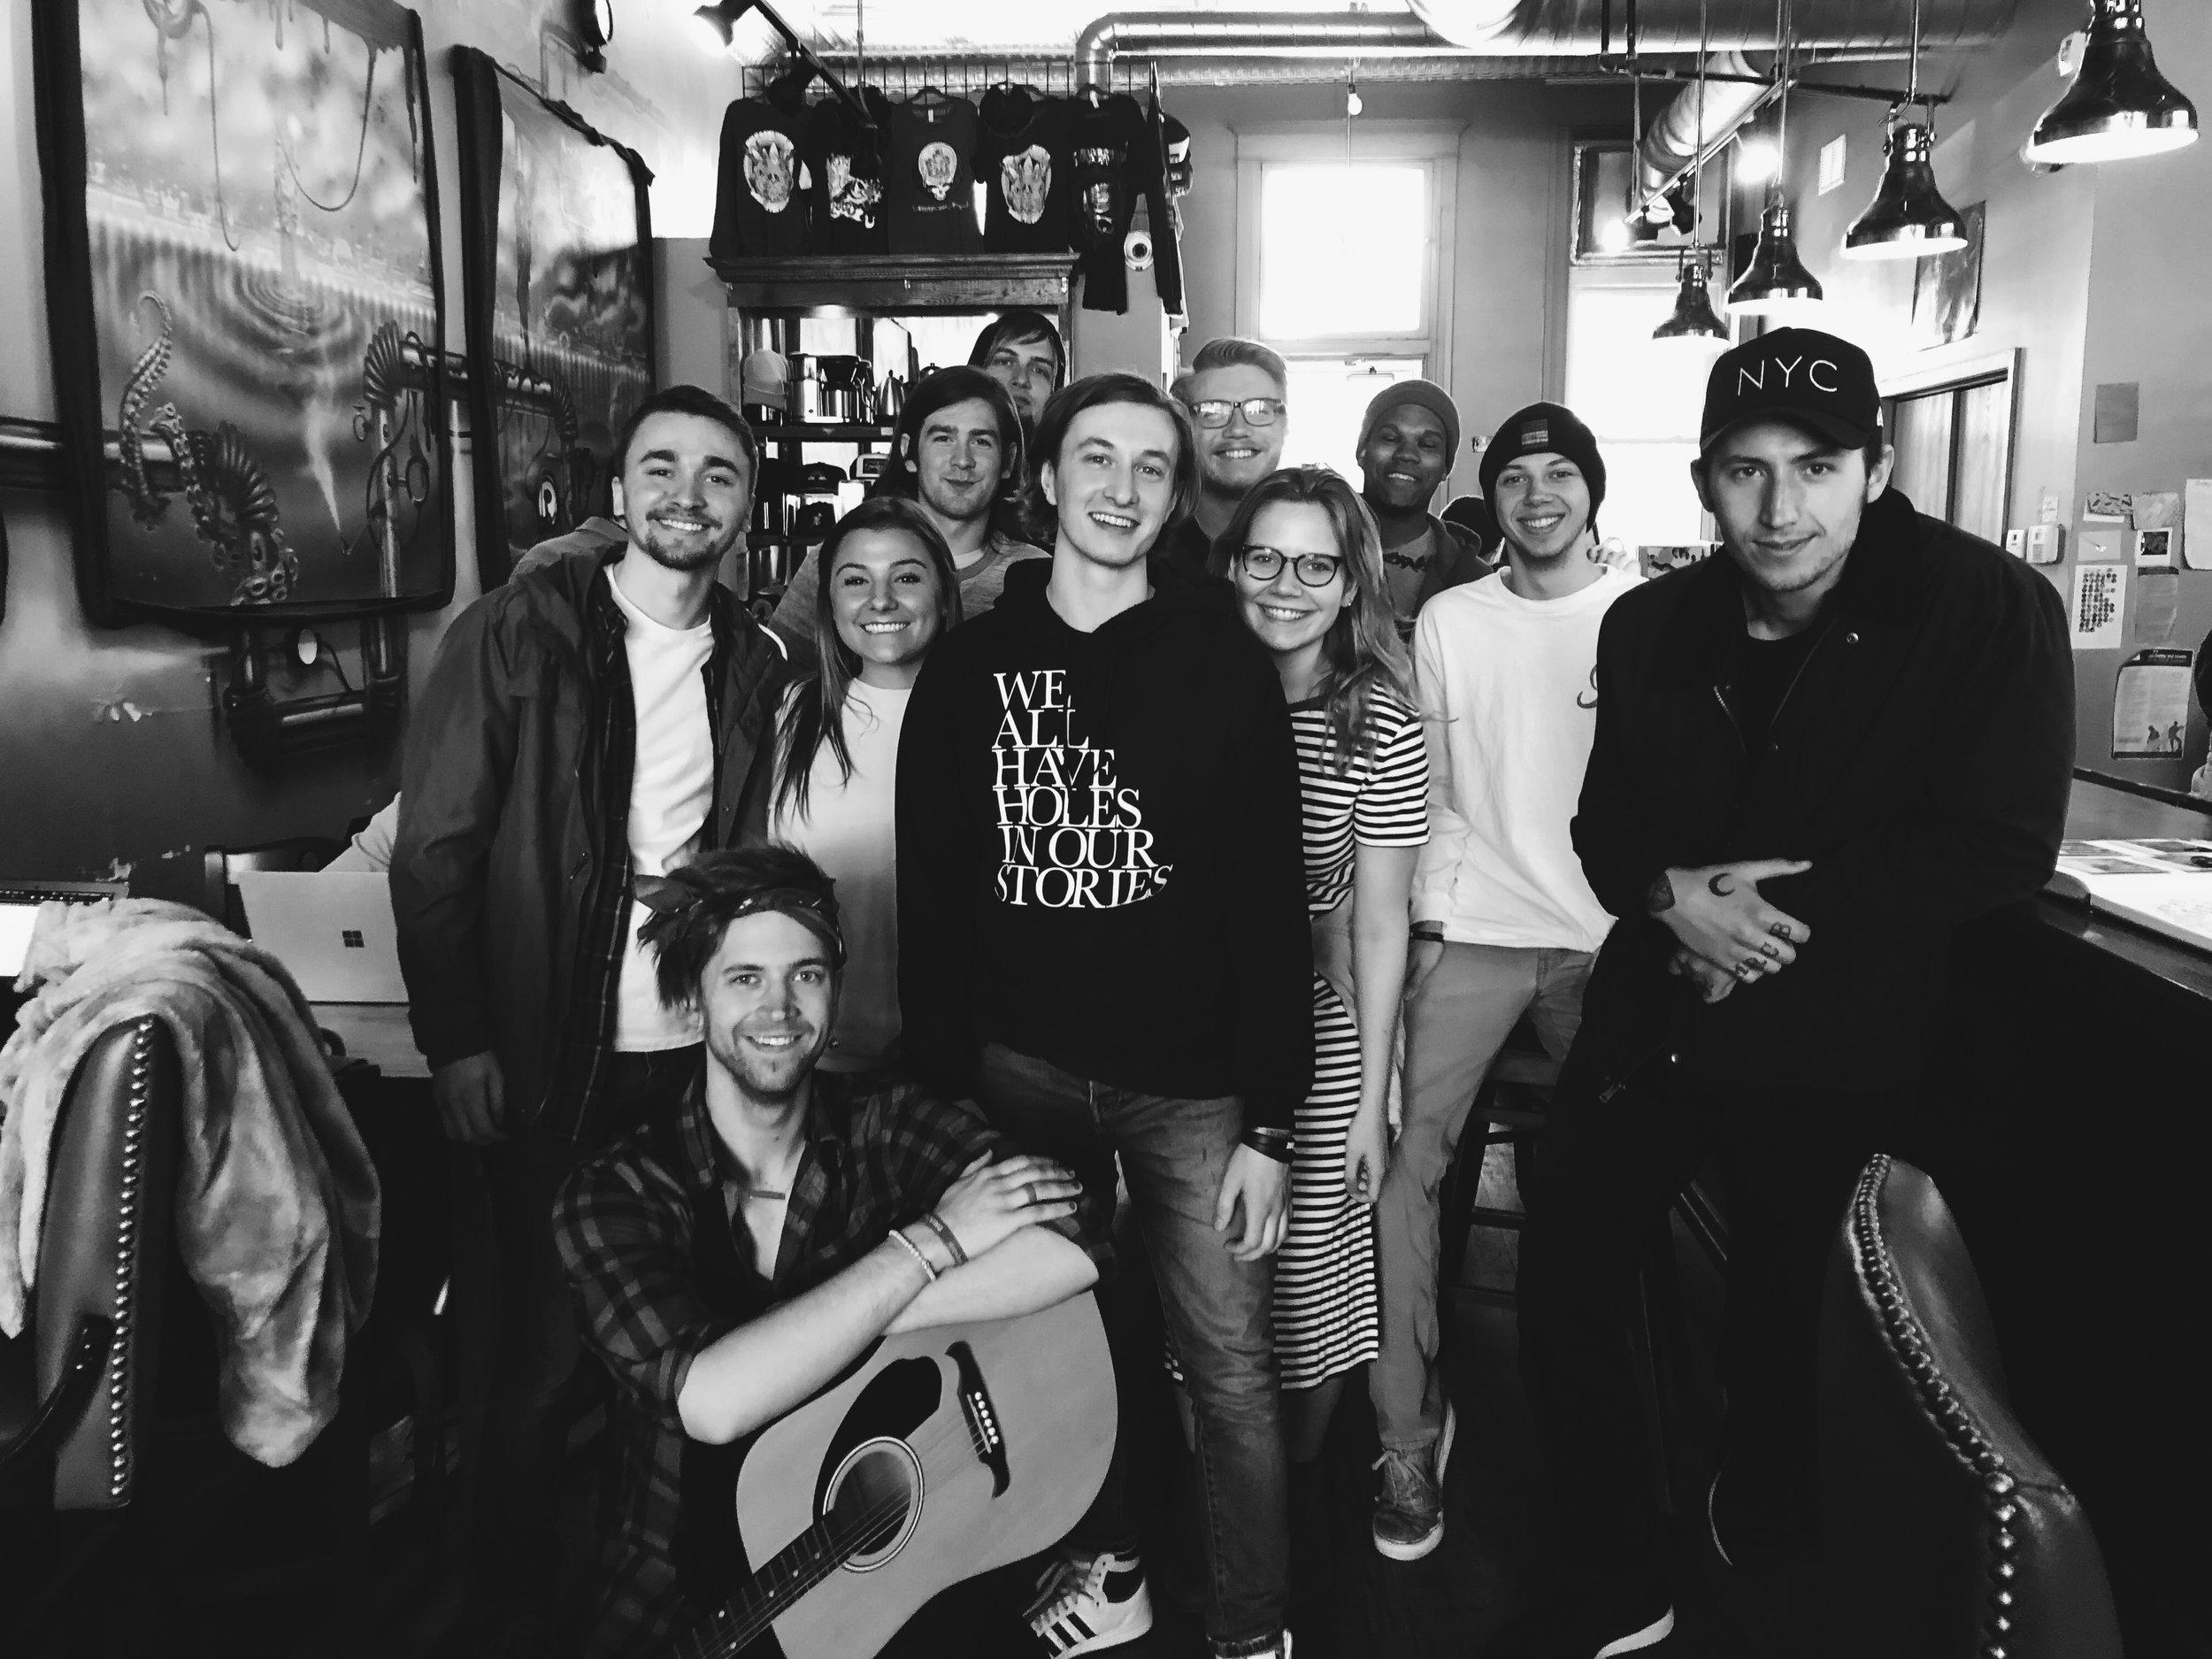 coffeeshop meetup.  Chicago, IL.